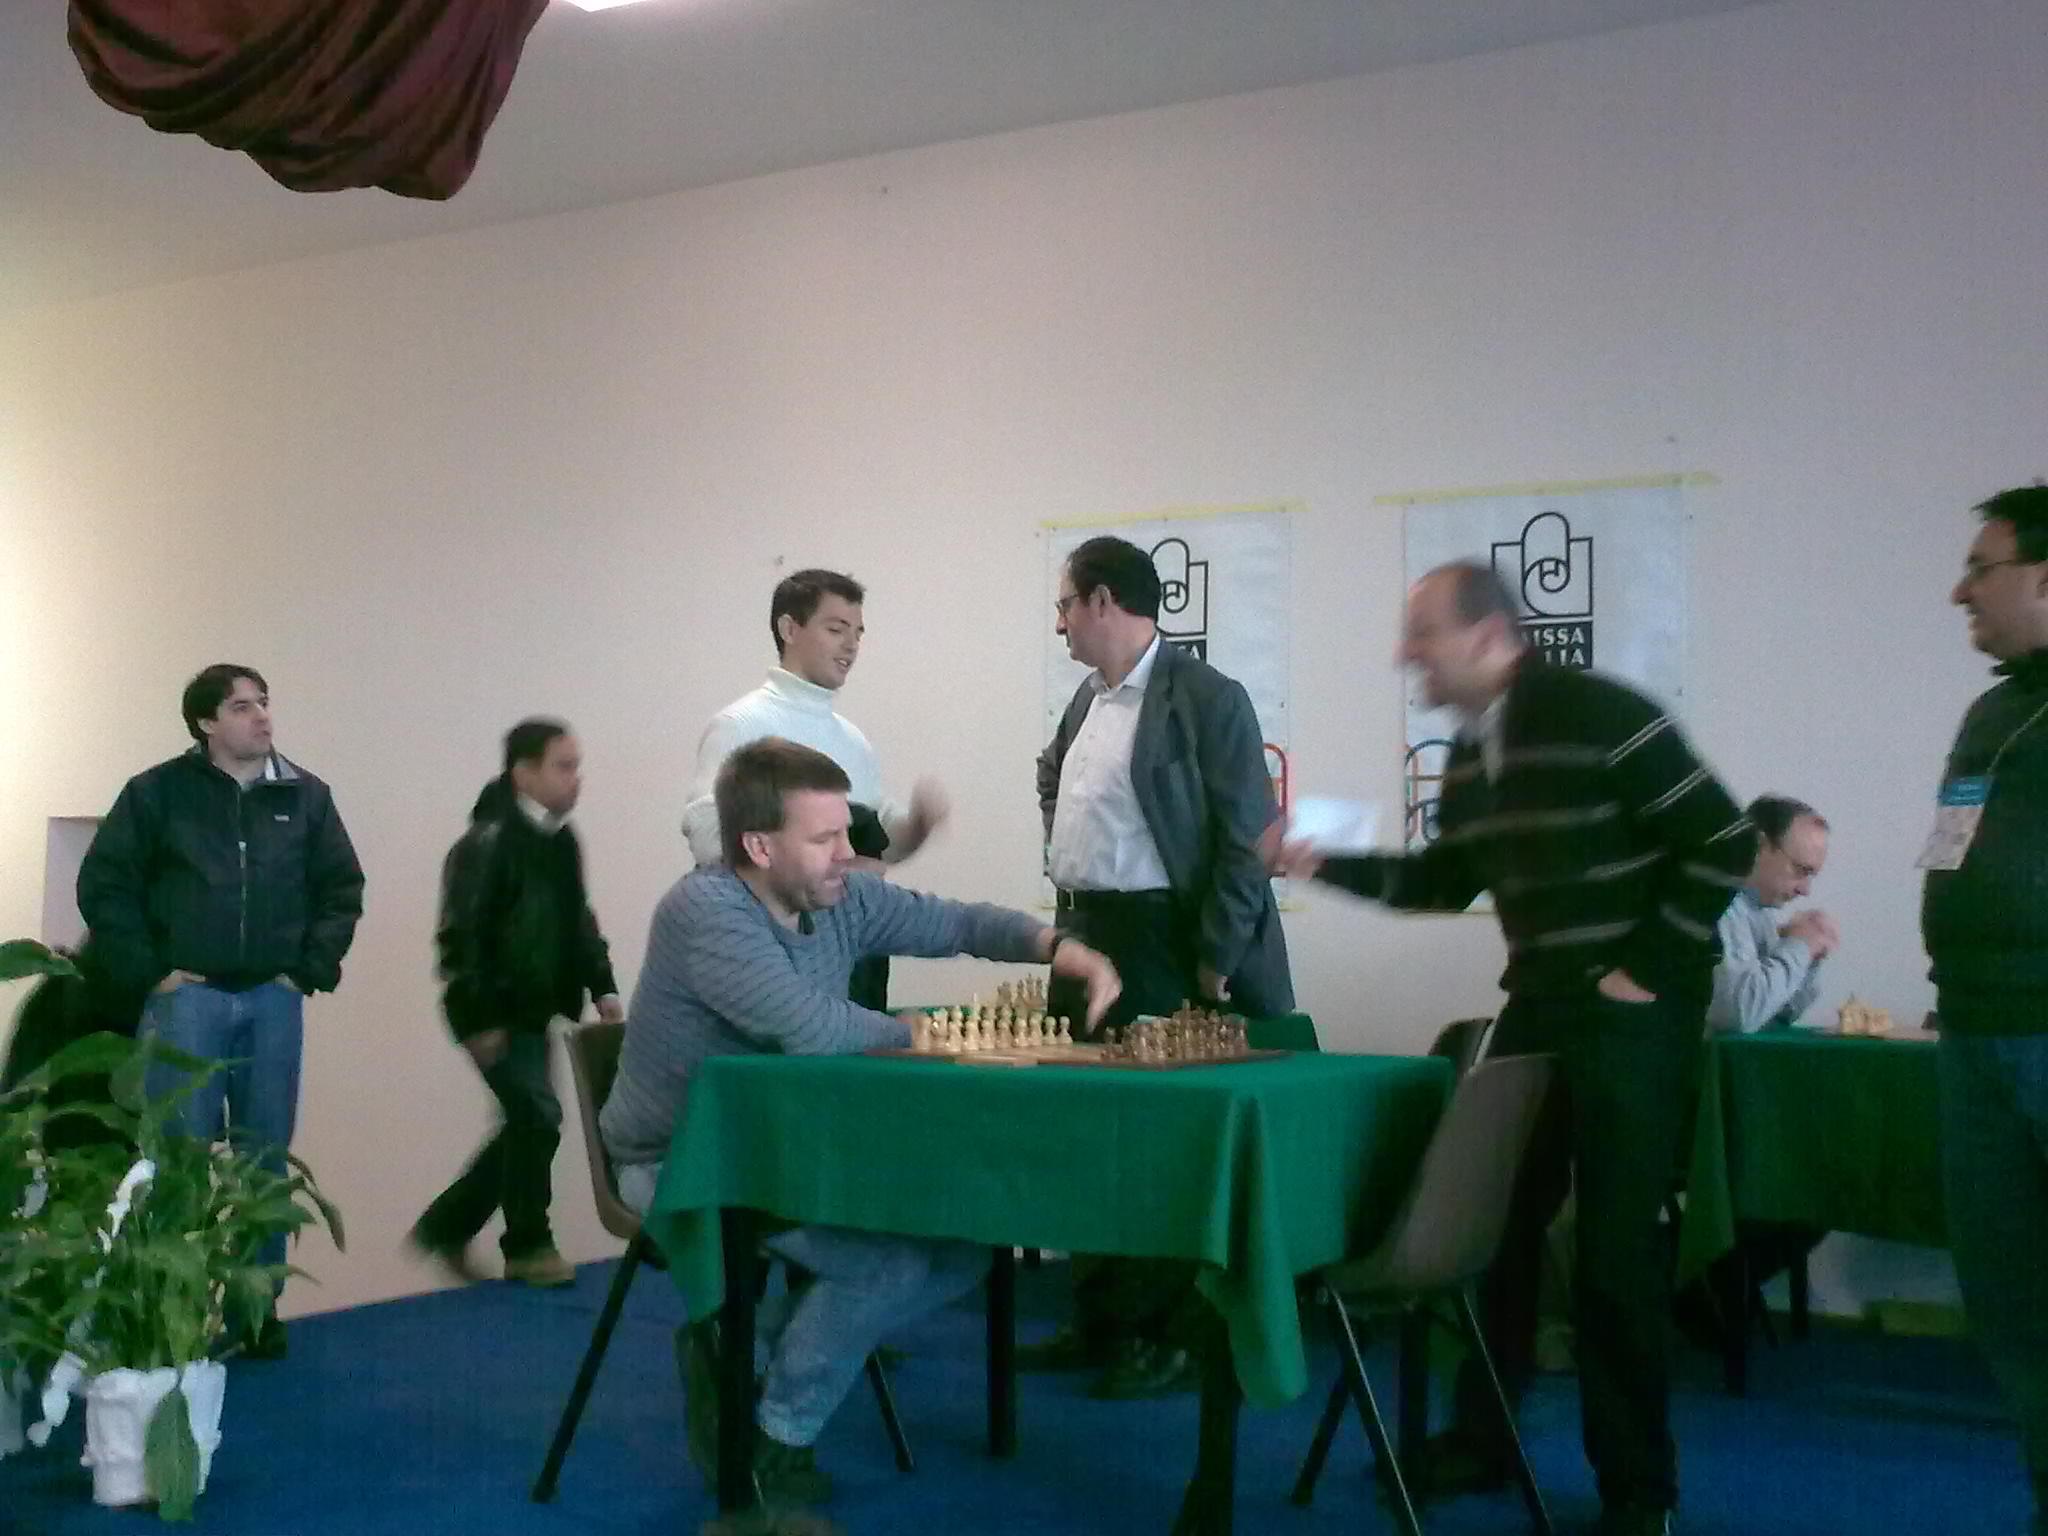 "Aagaard aseaza meticulos piesele, in timp ce Garrett (organizatorul) il ""prepara moral"", iar in spate Gelfand converseaza cu Shytaj"